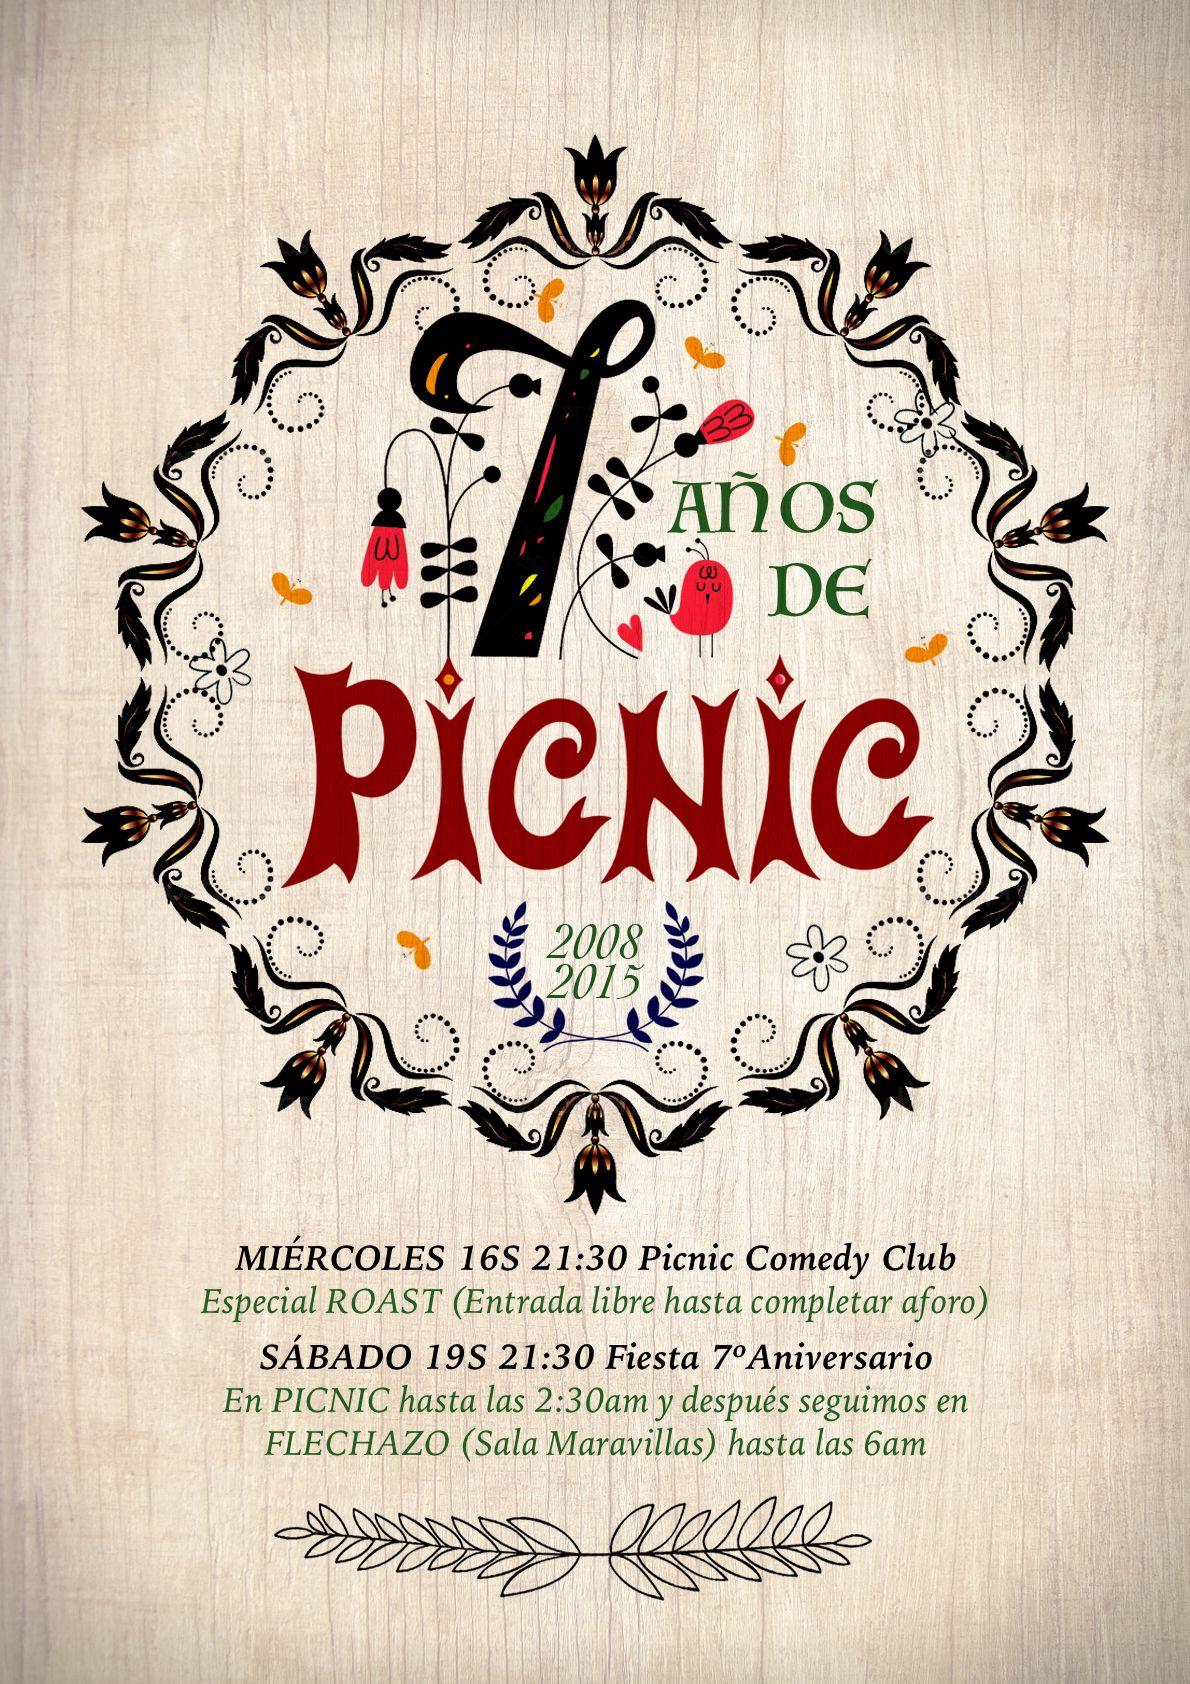 Cartel aniversario picnic